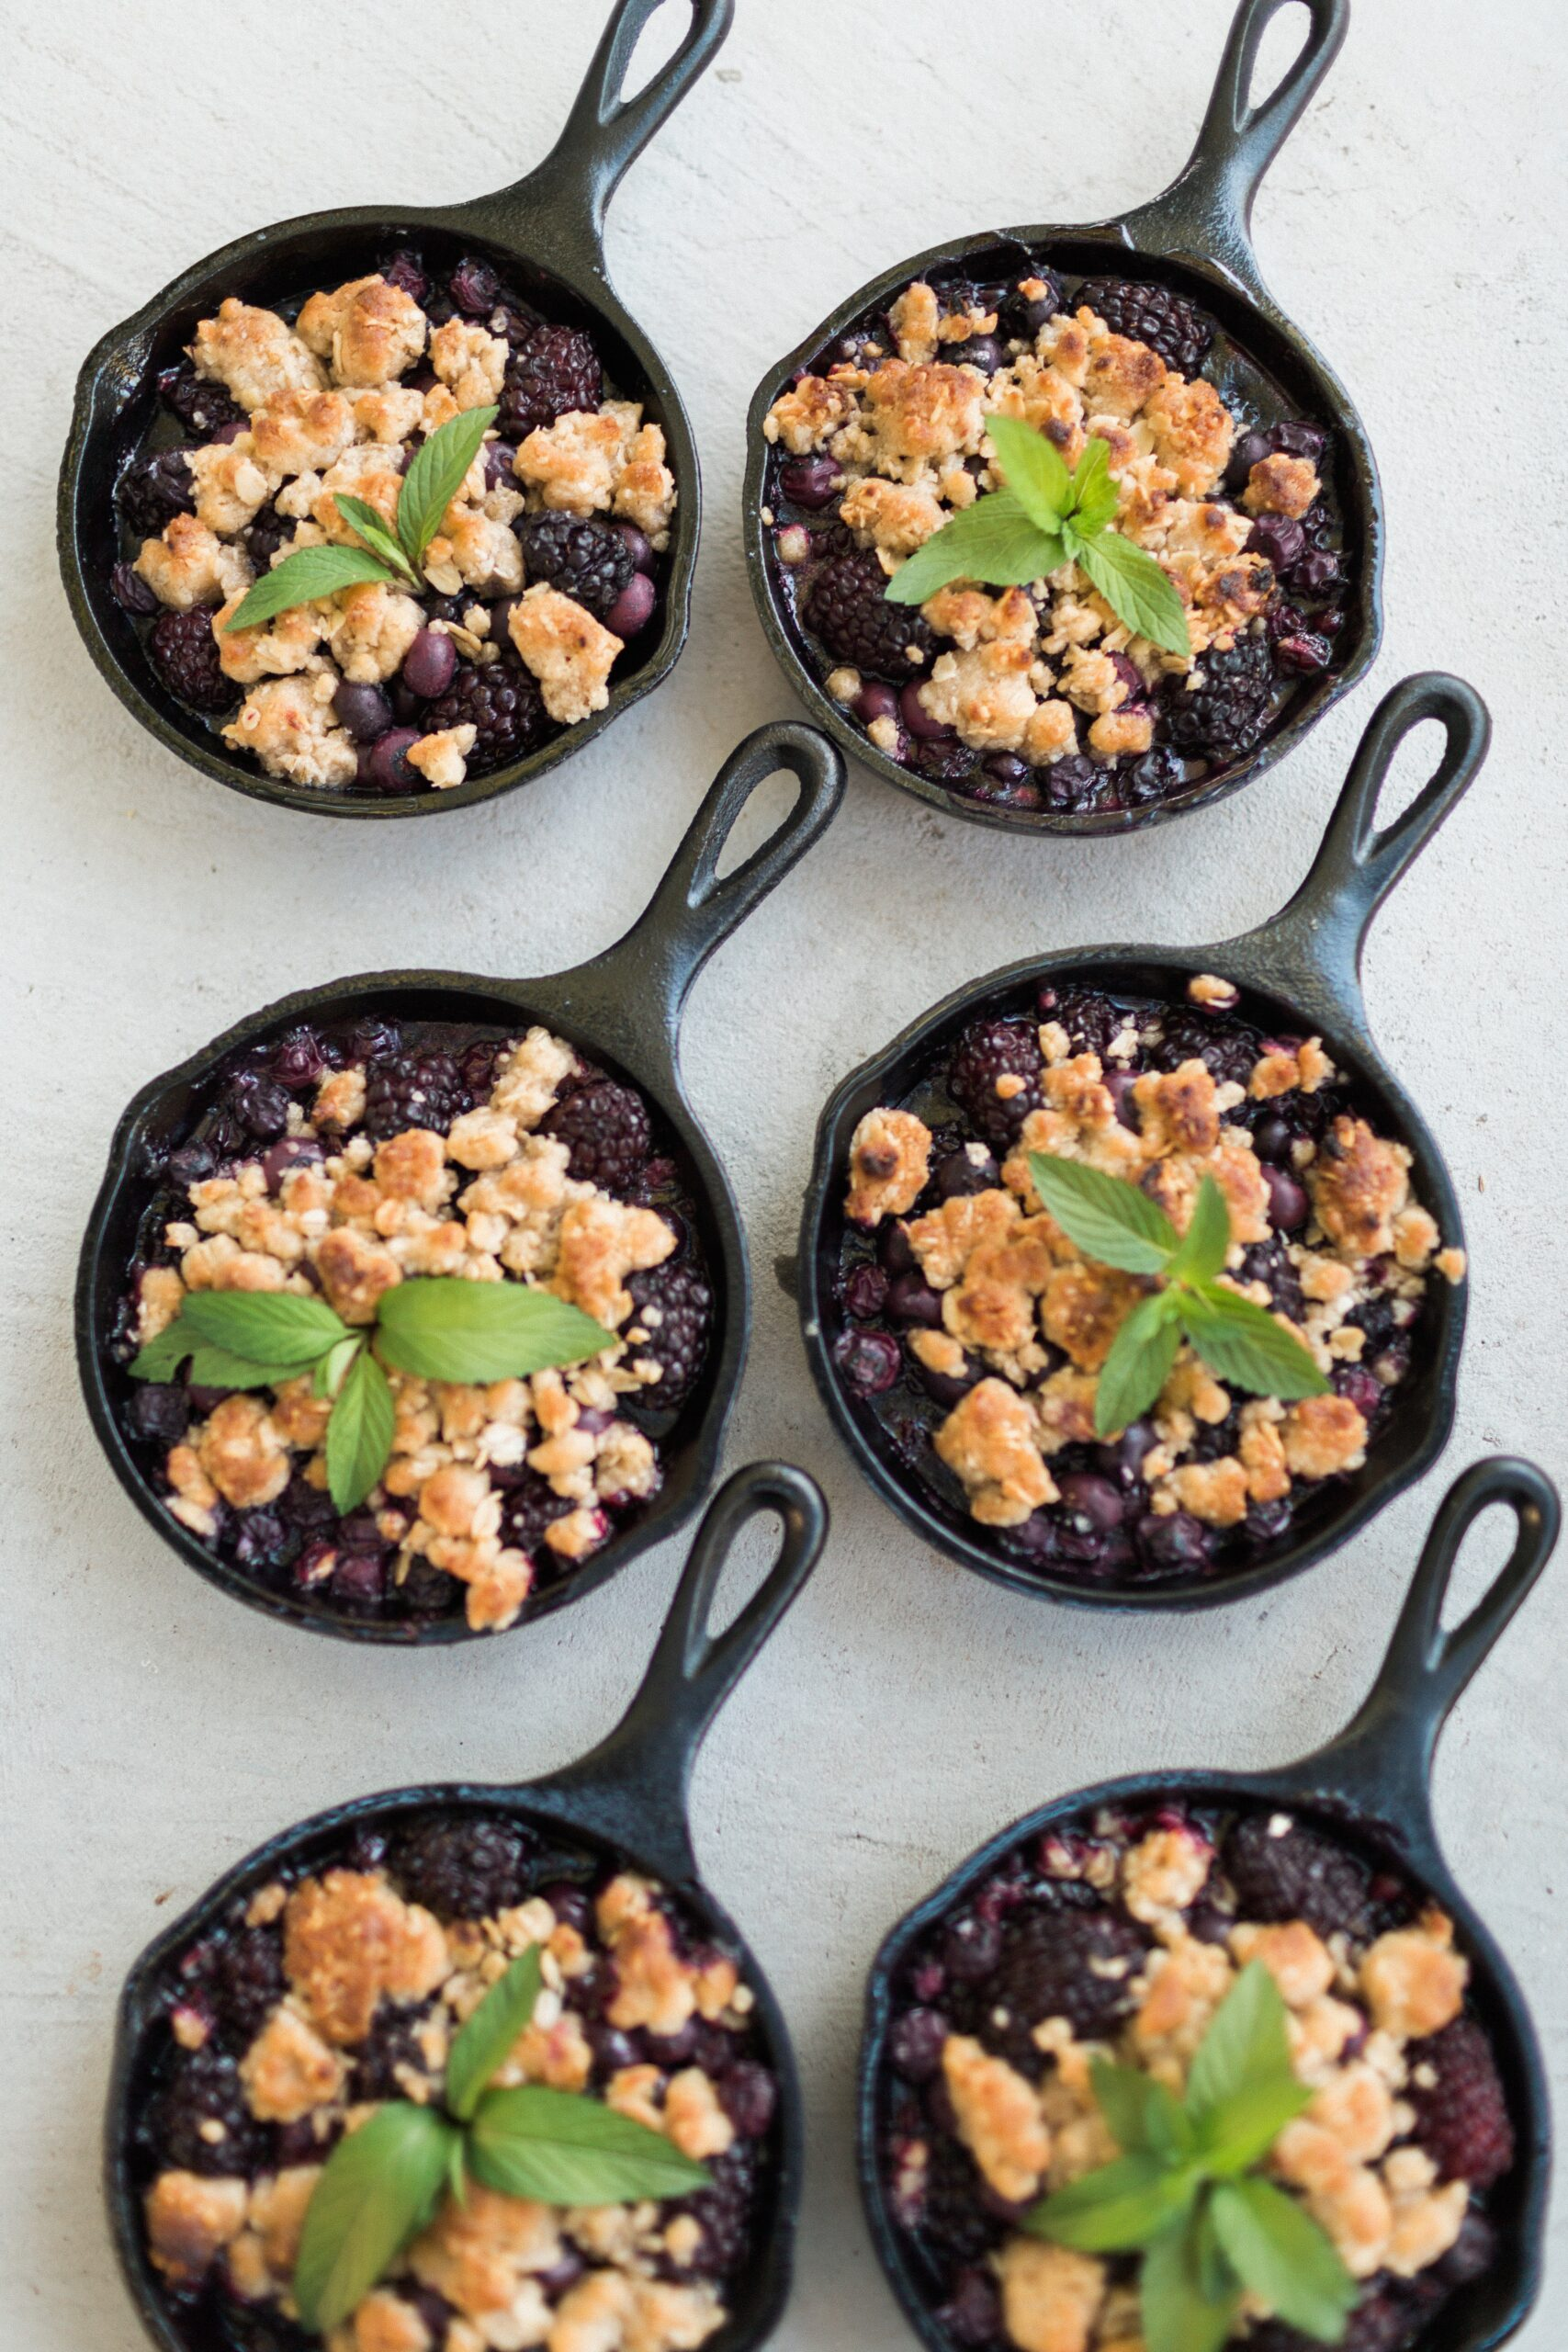 Best Summer Berry Recipes: Mini Blackberry Cobbler